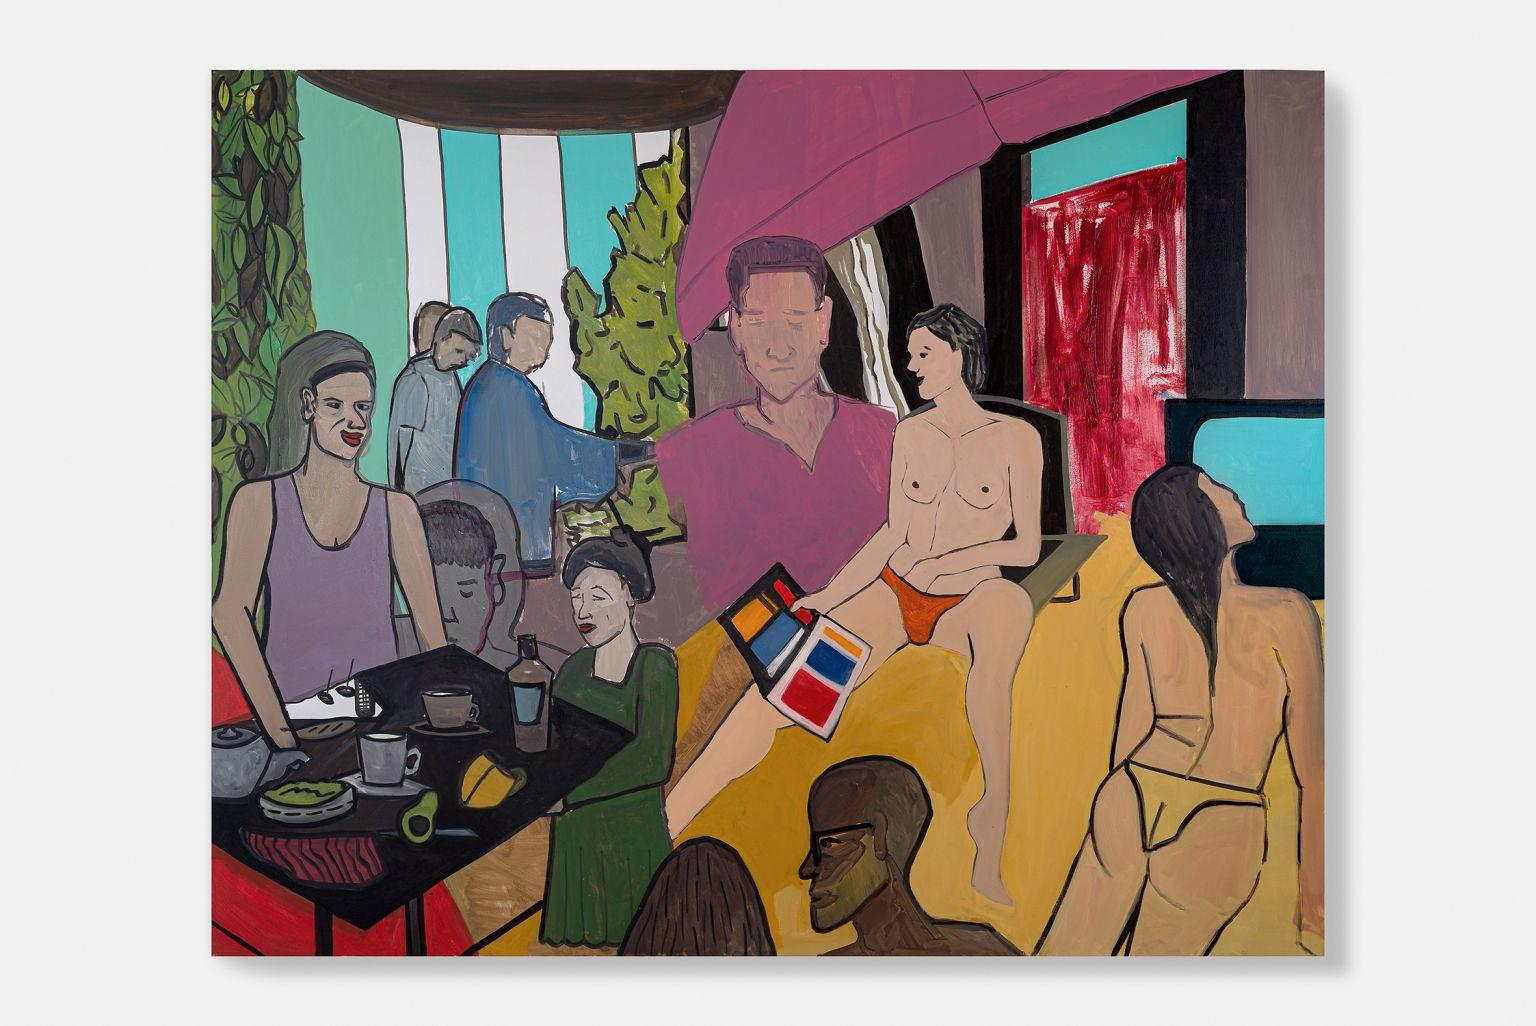 Buffer de verano (2019) - Pablo Linsambarth Cartagena - Pablo Linsambarth